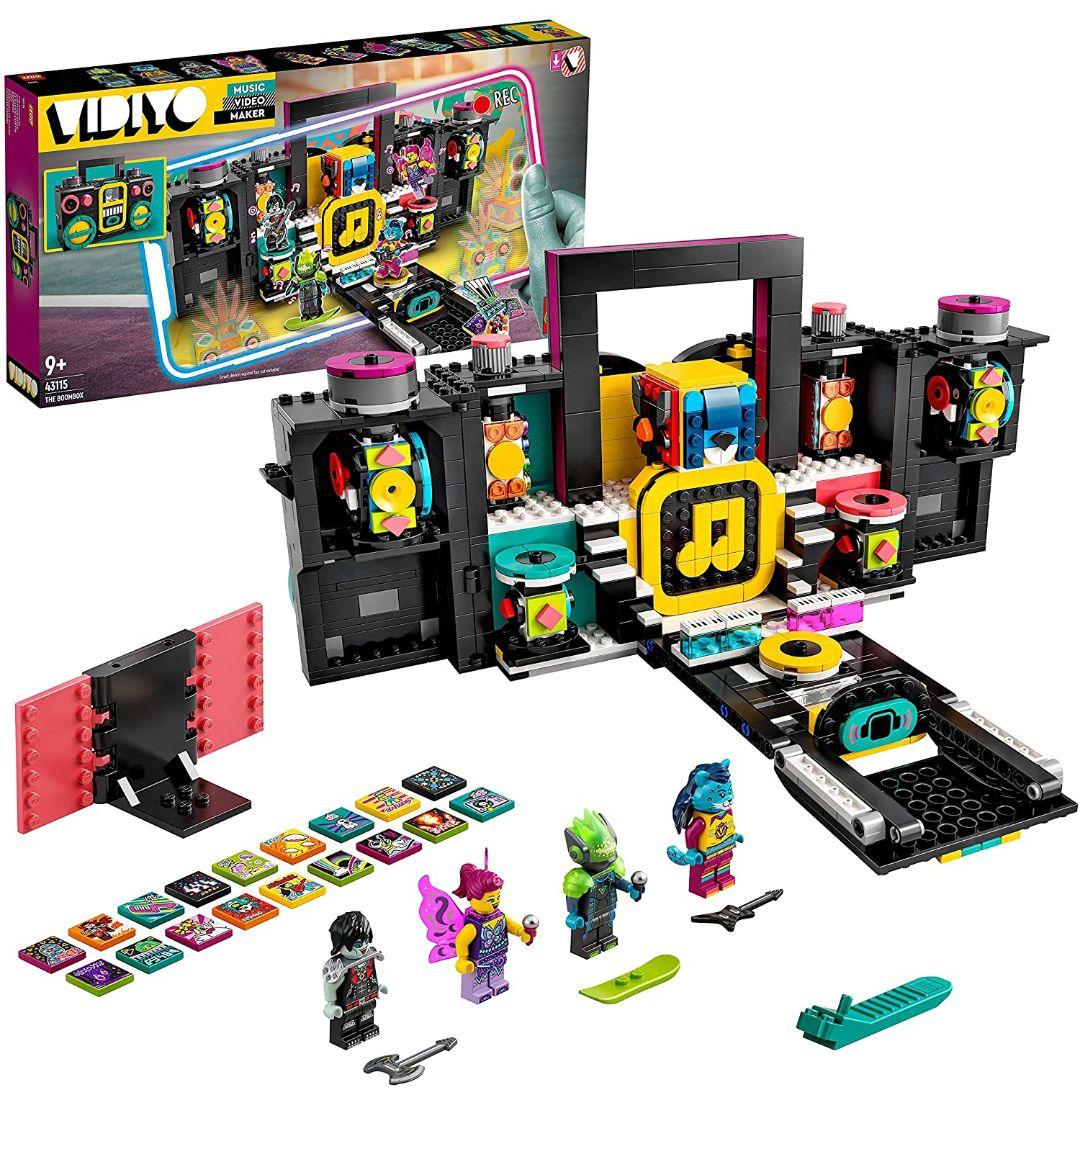 LEGO 43115 VIDIYO The Boombox Beatbox